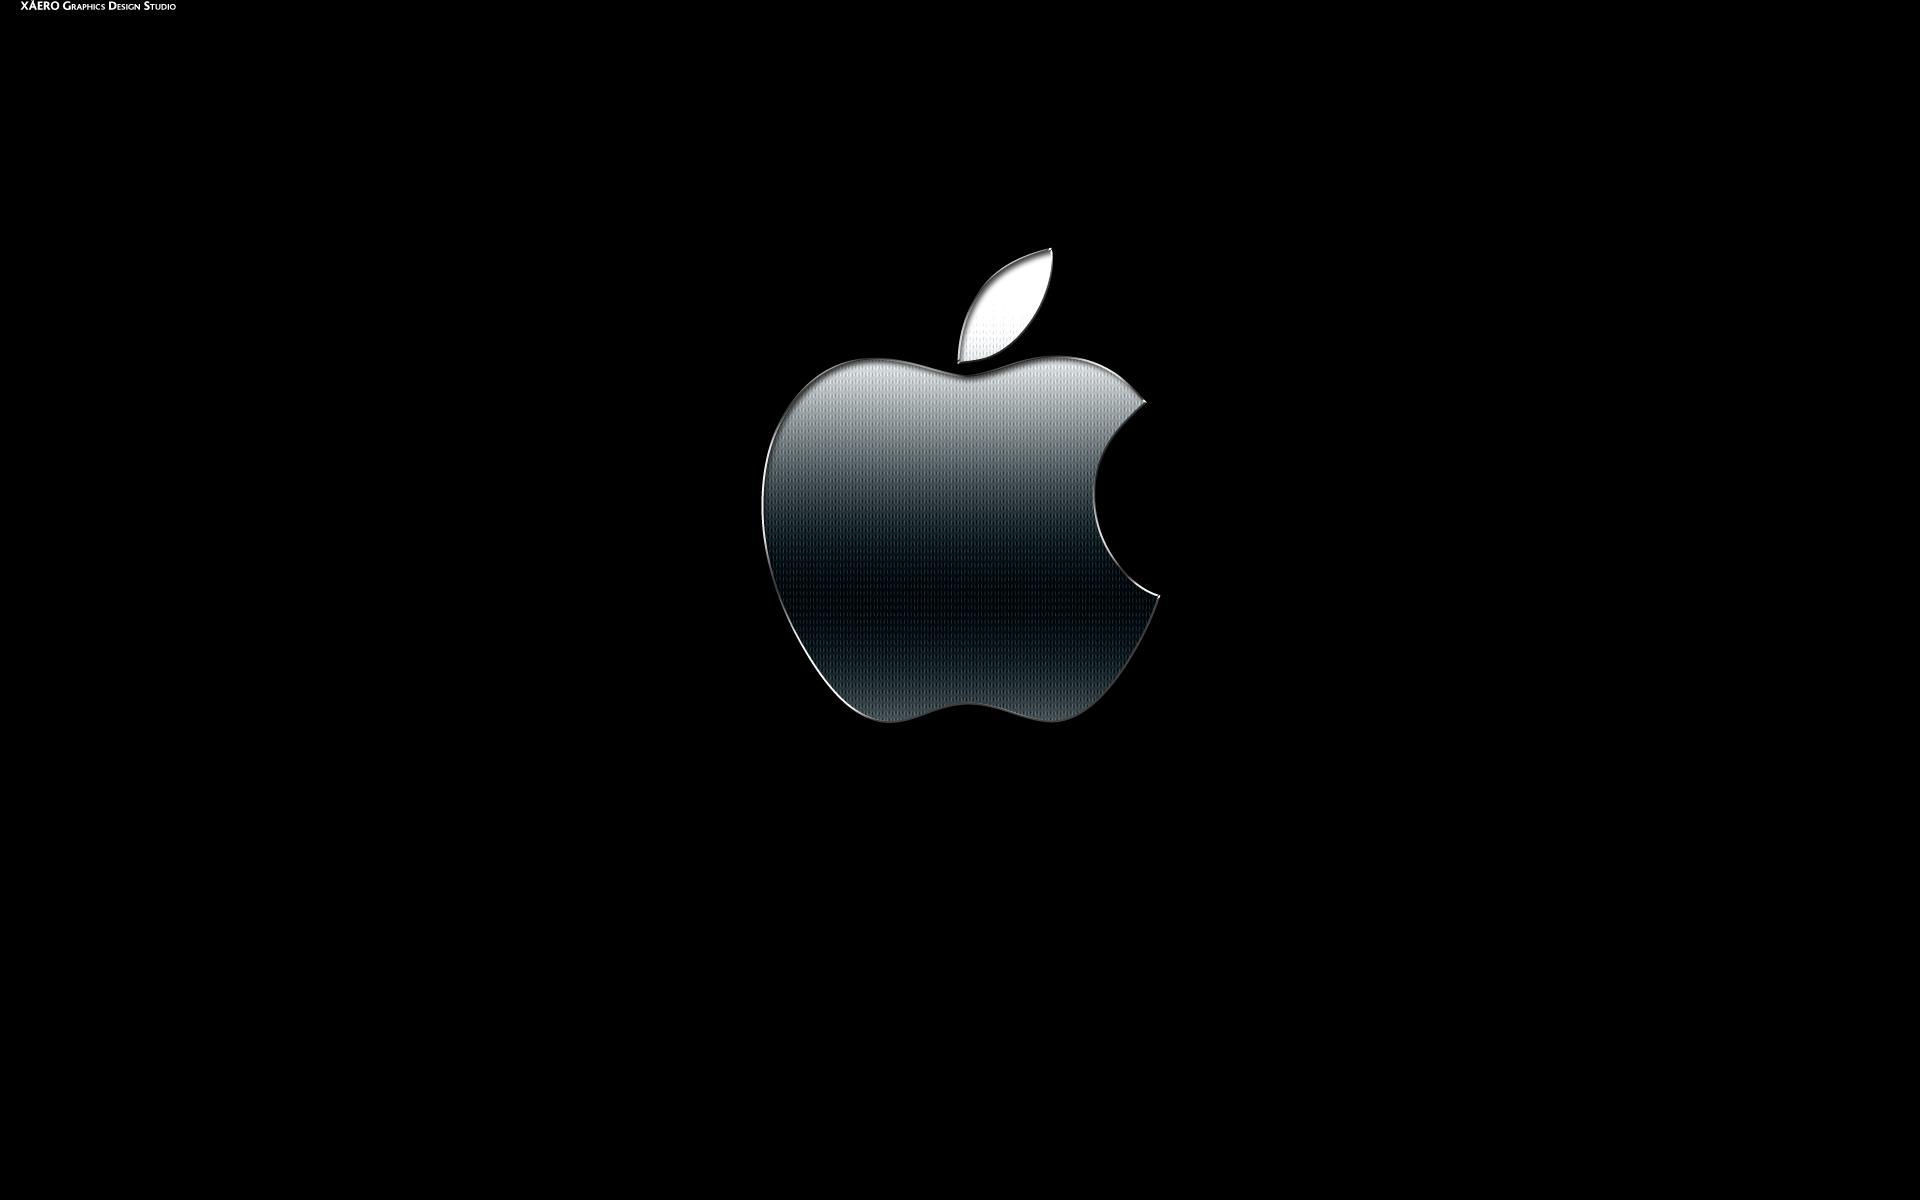 desktop widescreen wallpaper apple